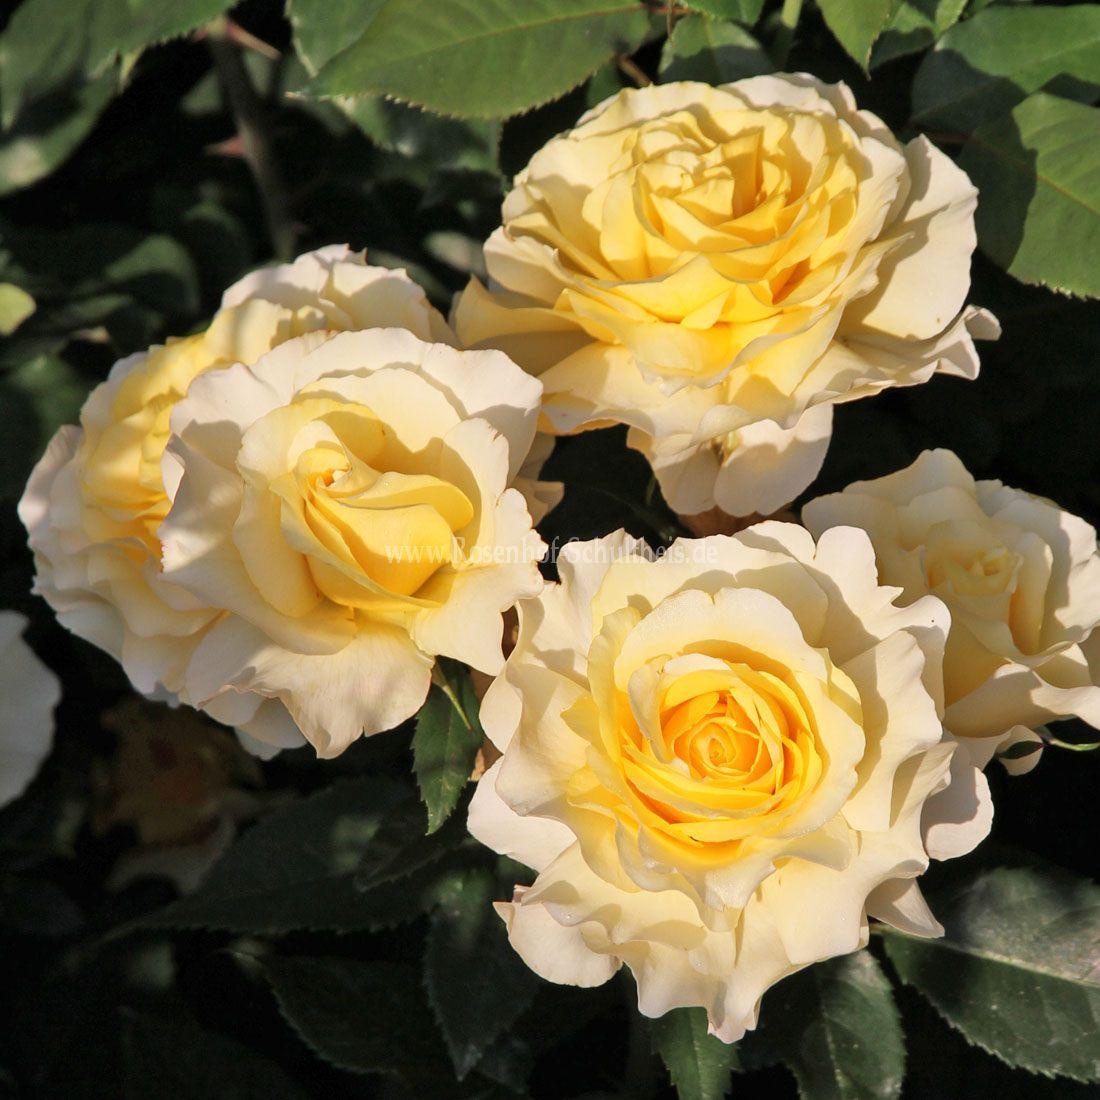 sunny sky rosen online kaufen im rosenhof schultheis rosen online kaufen im rosenhof schultheis. Black Bedroom Furniture Sets. Home Design Ideas